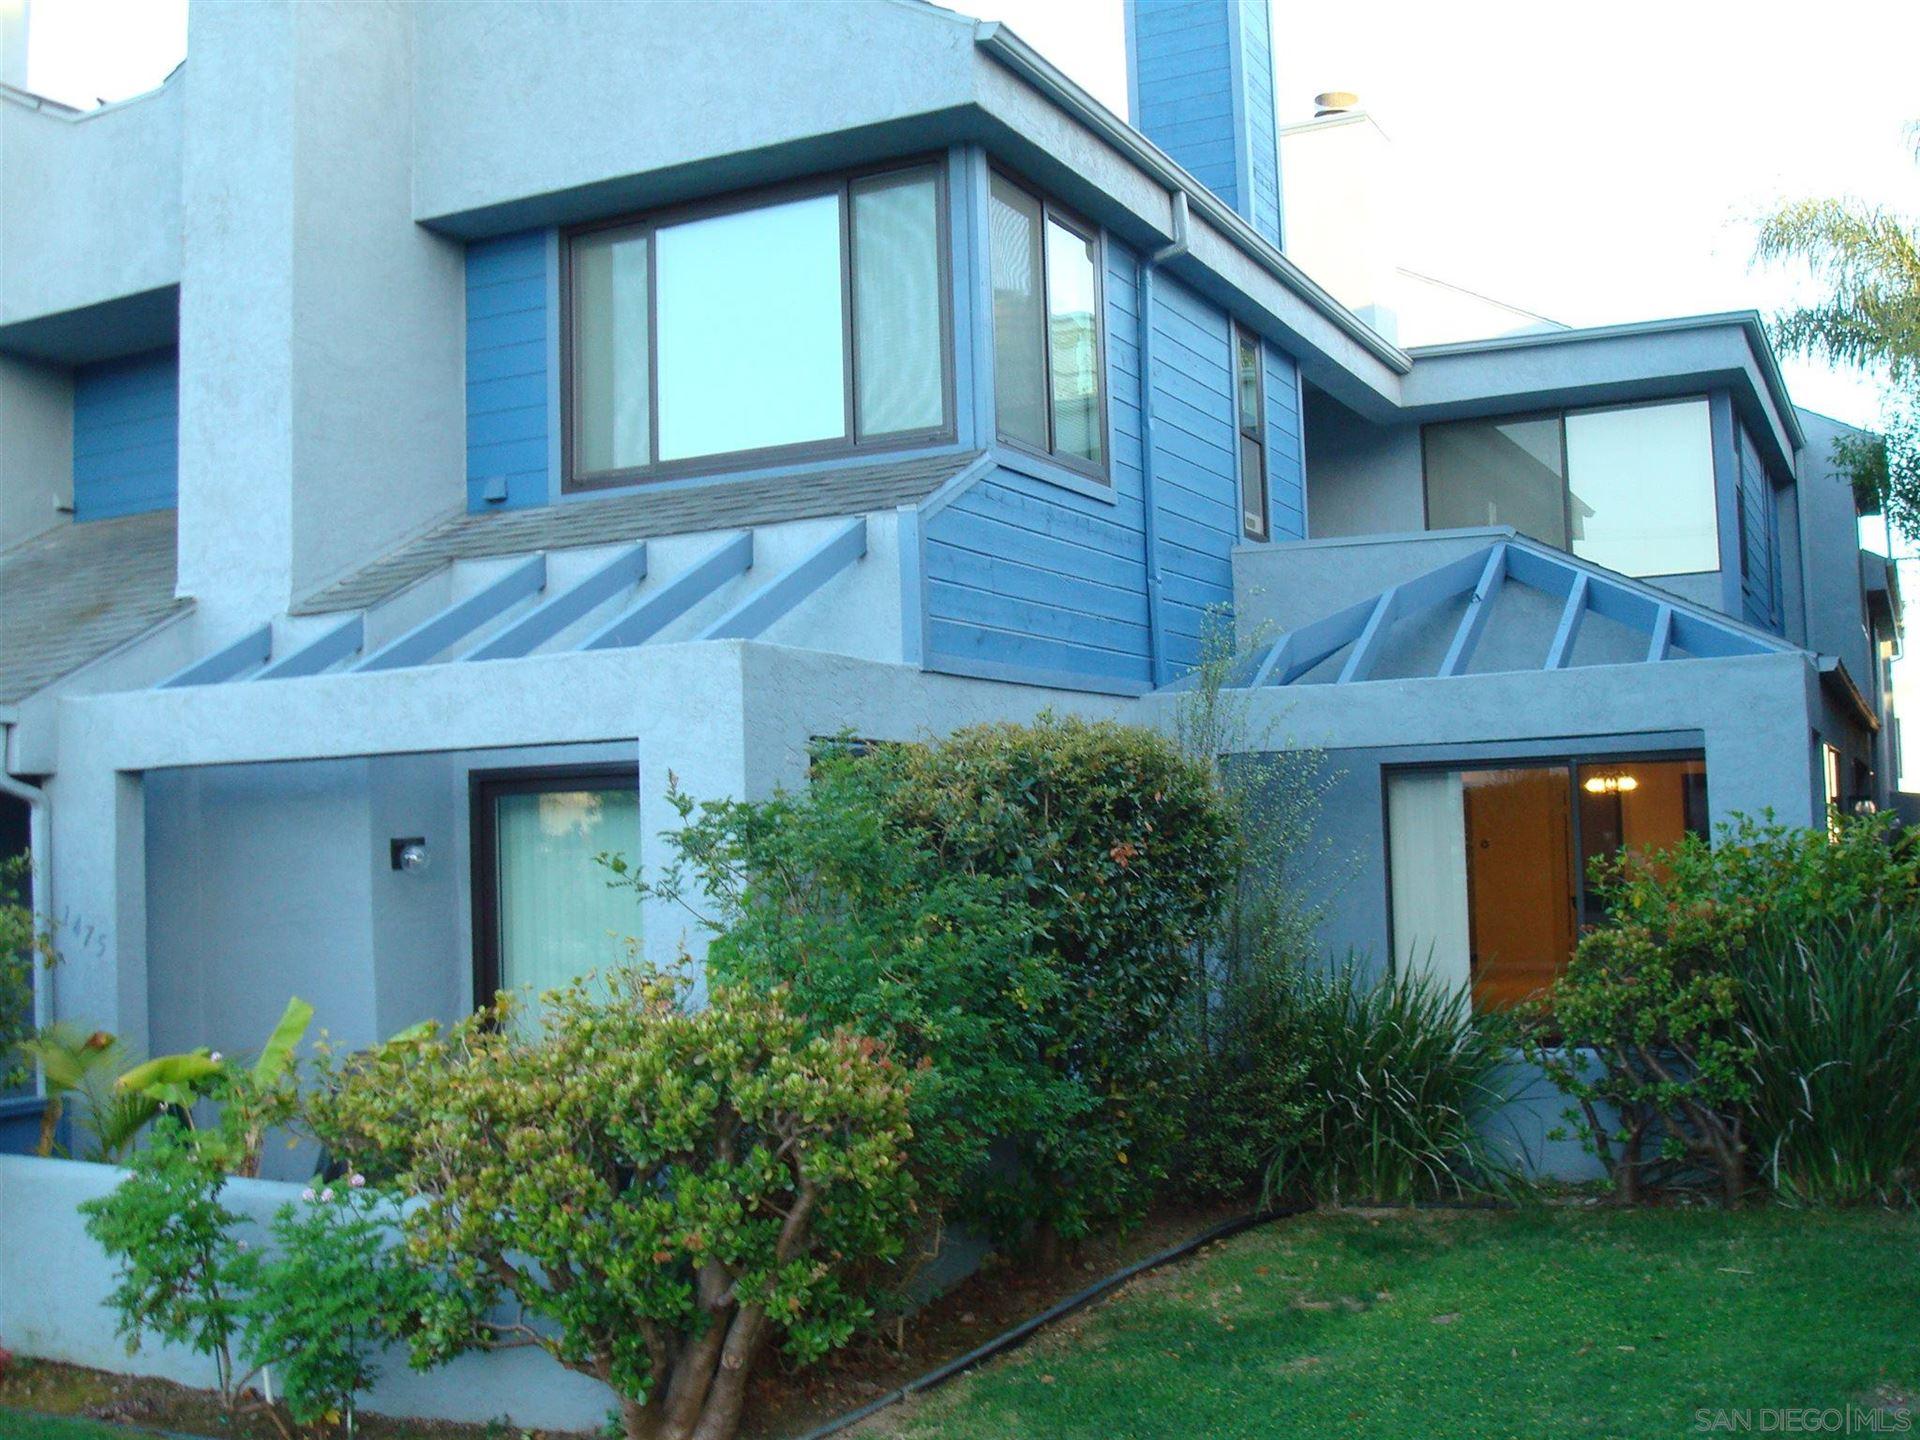 Photo for 1473 Chalcedony St, San Diego, CA 92109 (MLS # 200048500)